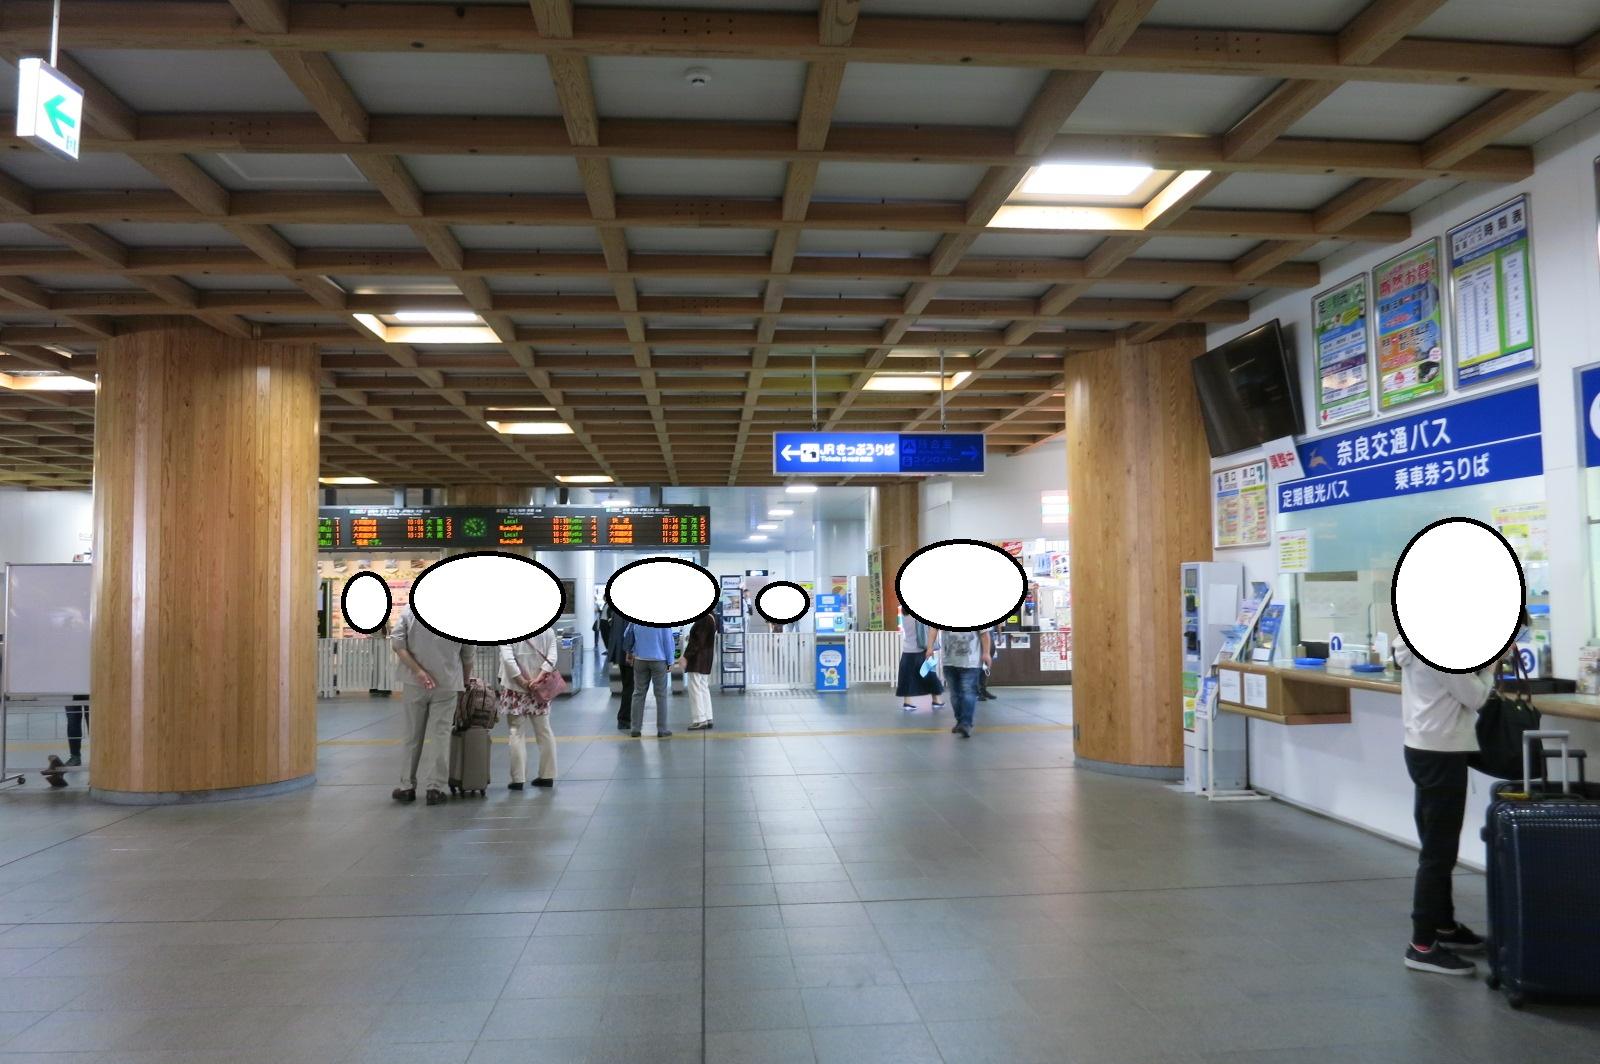 JR奈良駅到着です。近鉄奈良駅より混雑していなくて、落ち着いた感じでした。